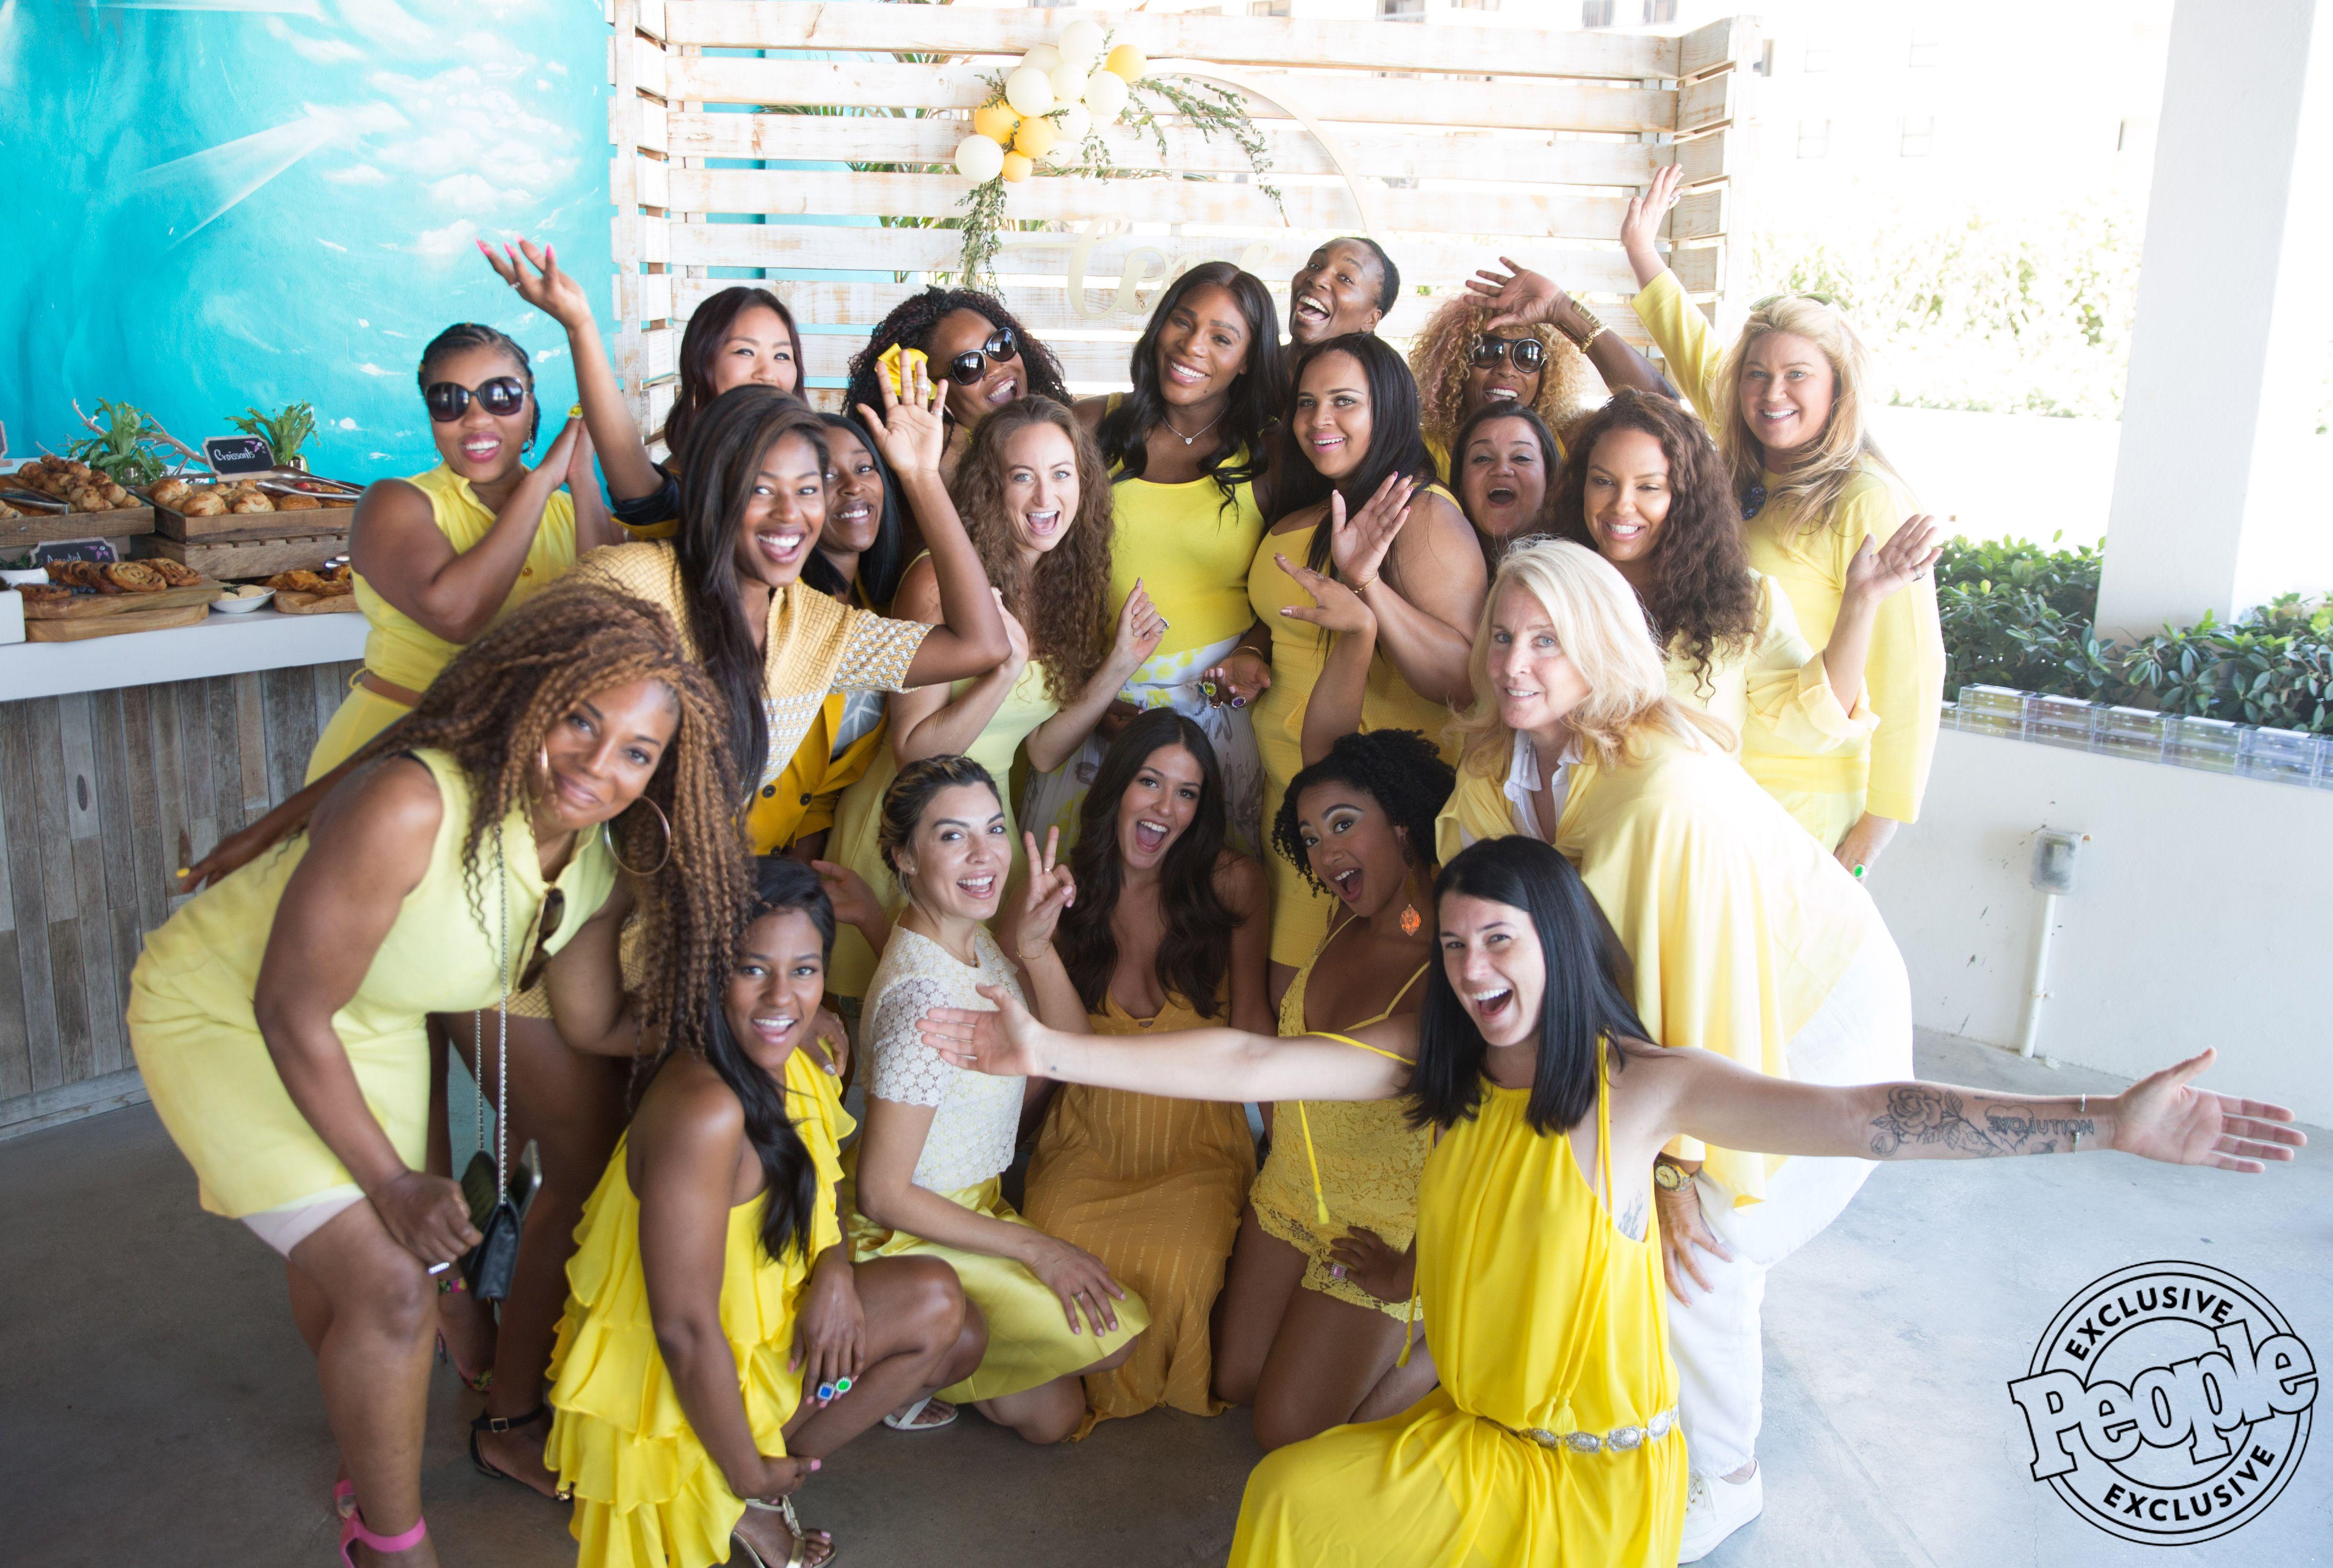 Nacho Average Bride Serena Williams 2-Day Bridal Shower 4